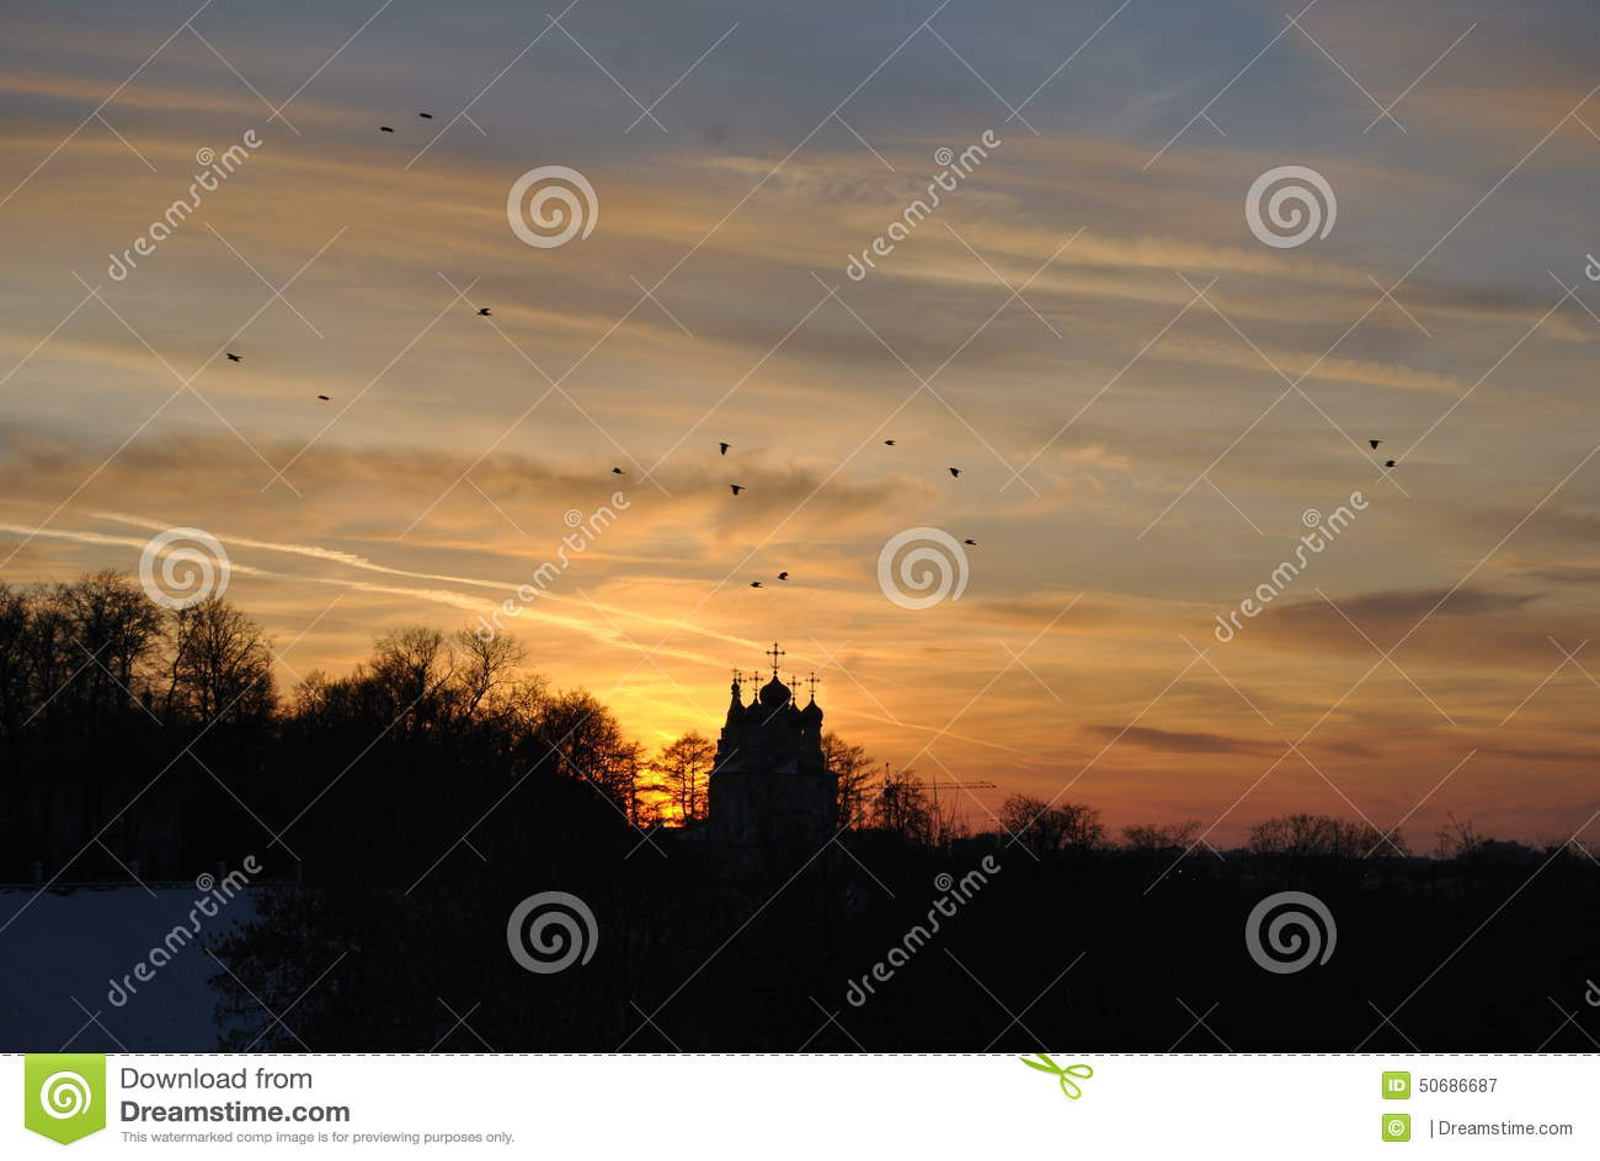 Download 教堂 库存图片. 图片 包括有 日落, 鸟舍, 天空, 阳光, 冬天, 云彩, 飞行, 教堂, 结构树, 的treadled - 50686687